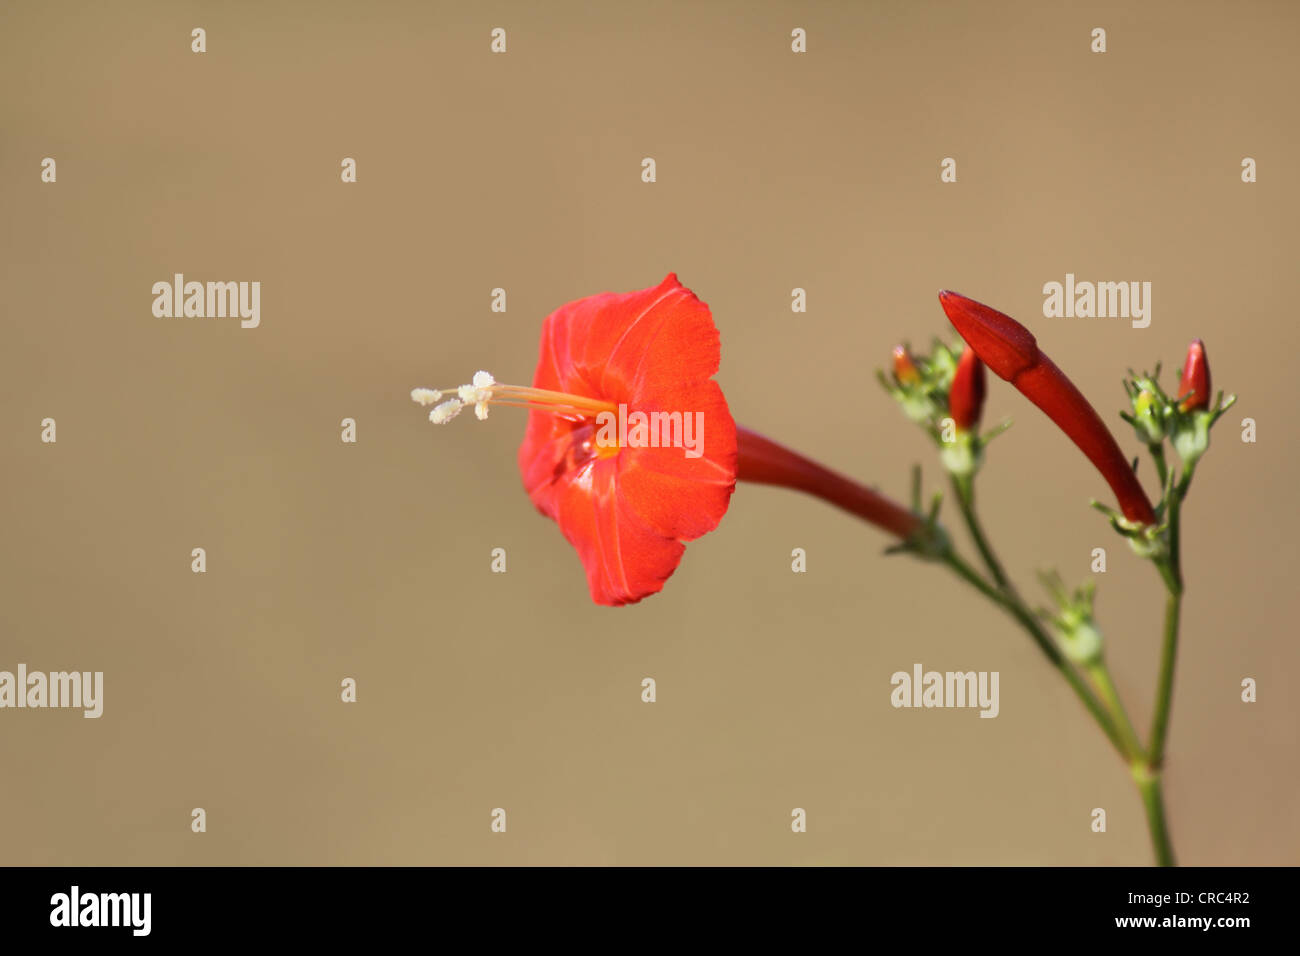 Scarlet Morning Glory (Ipomoea hederifolia) flower - Stock Image